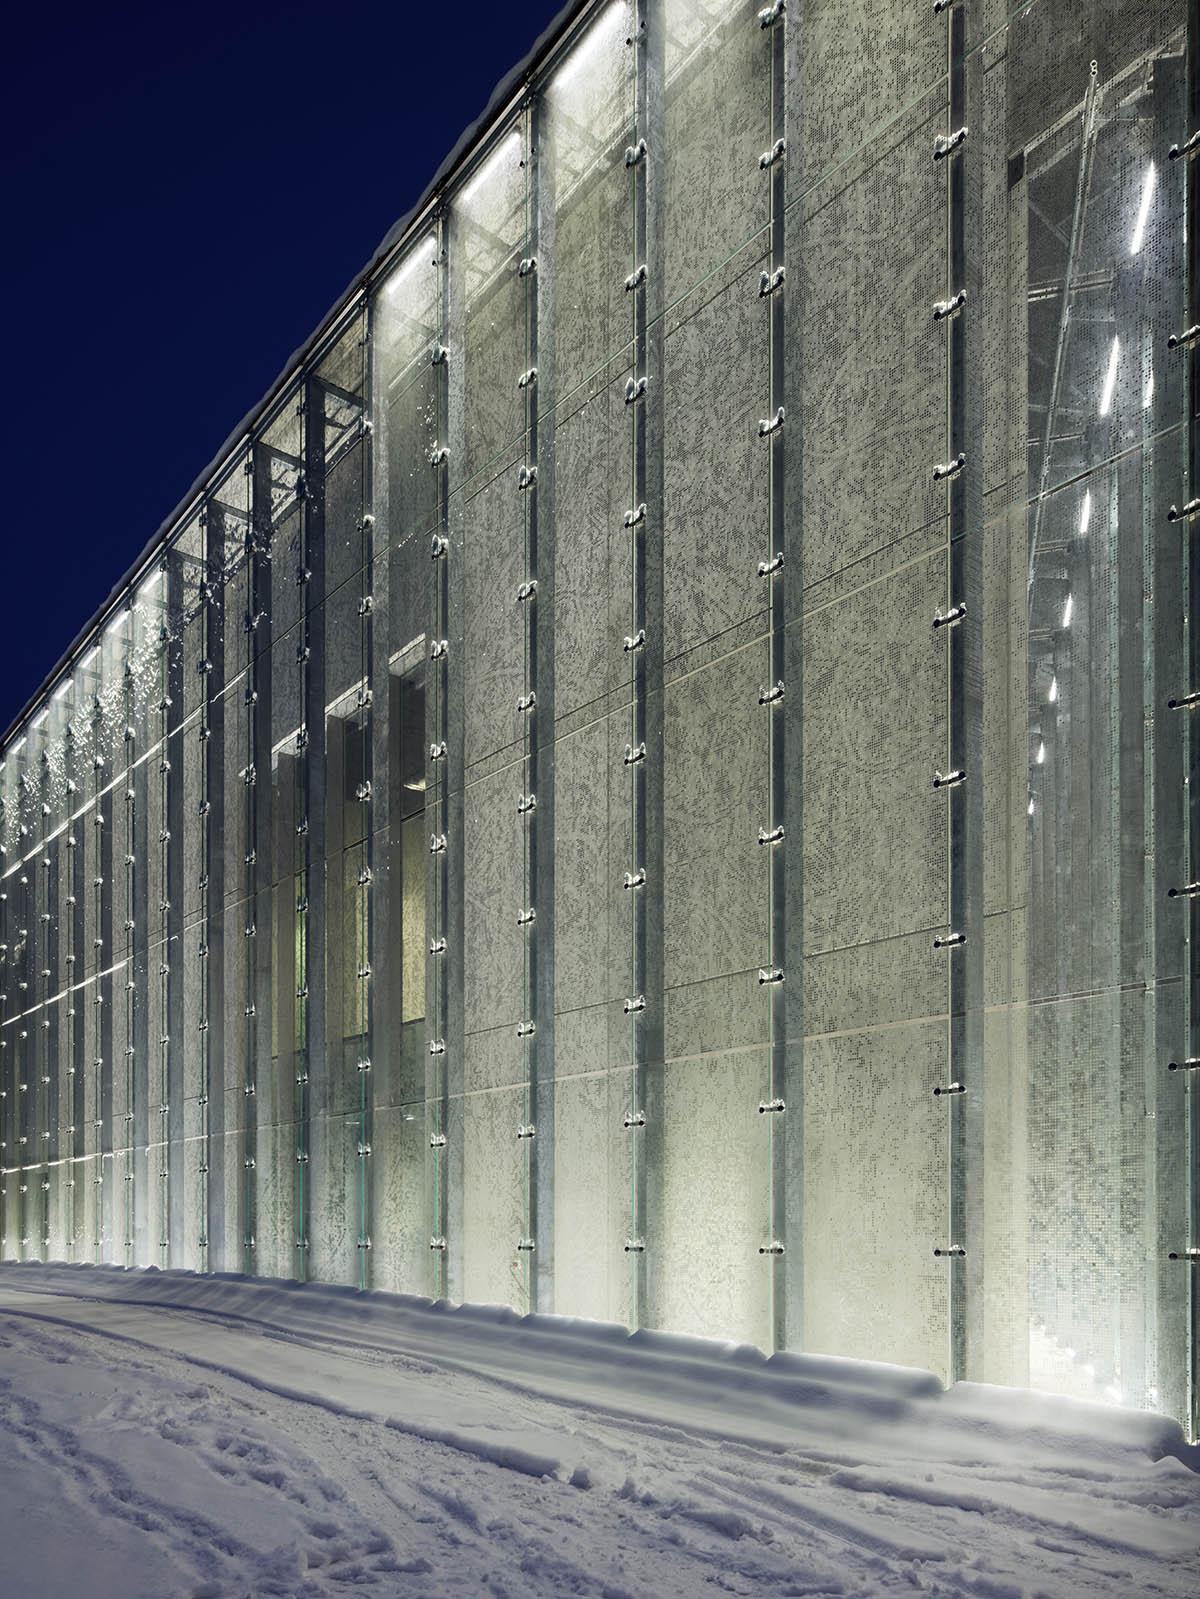 The Estonian National Museum Iguzzini